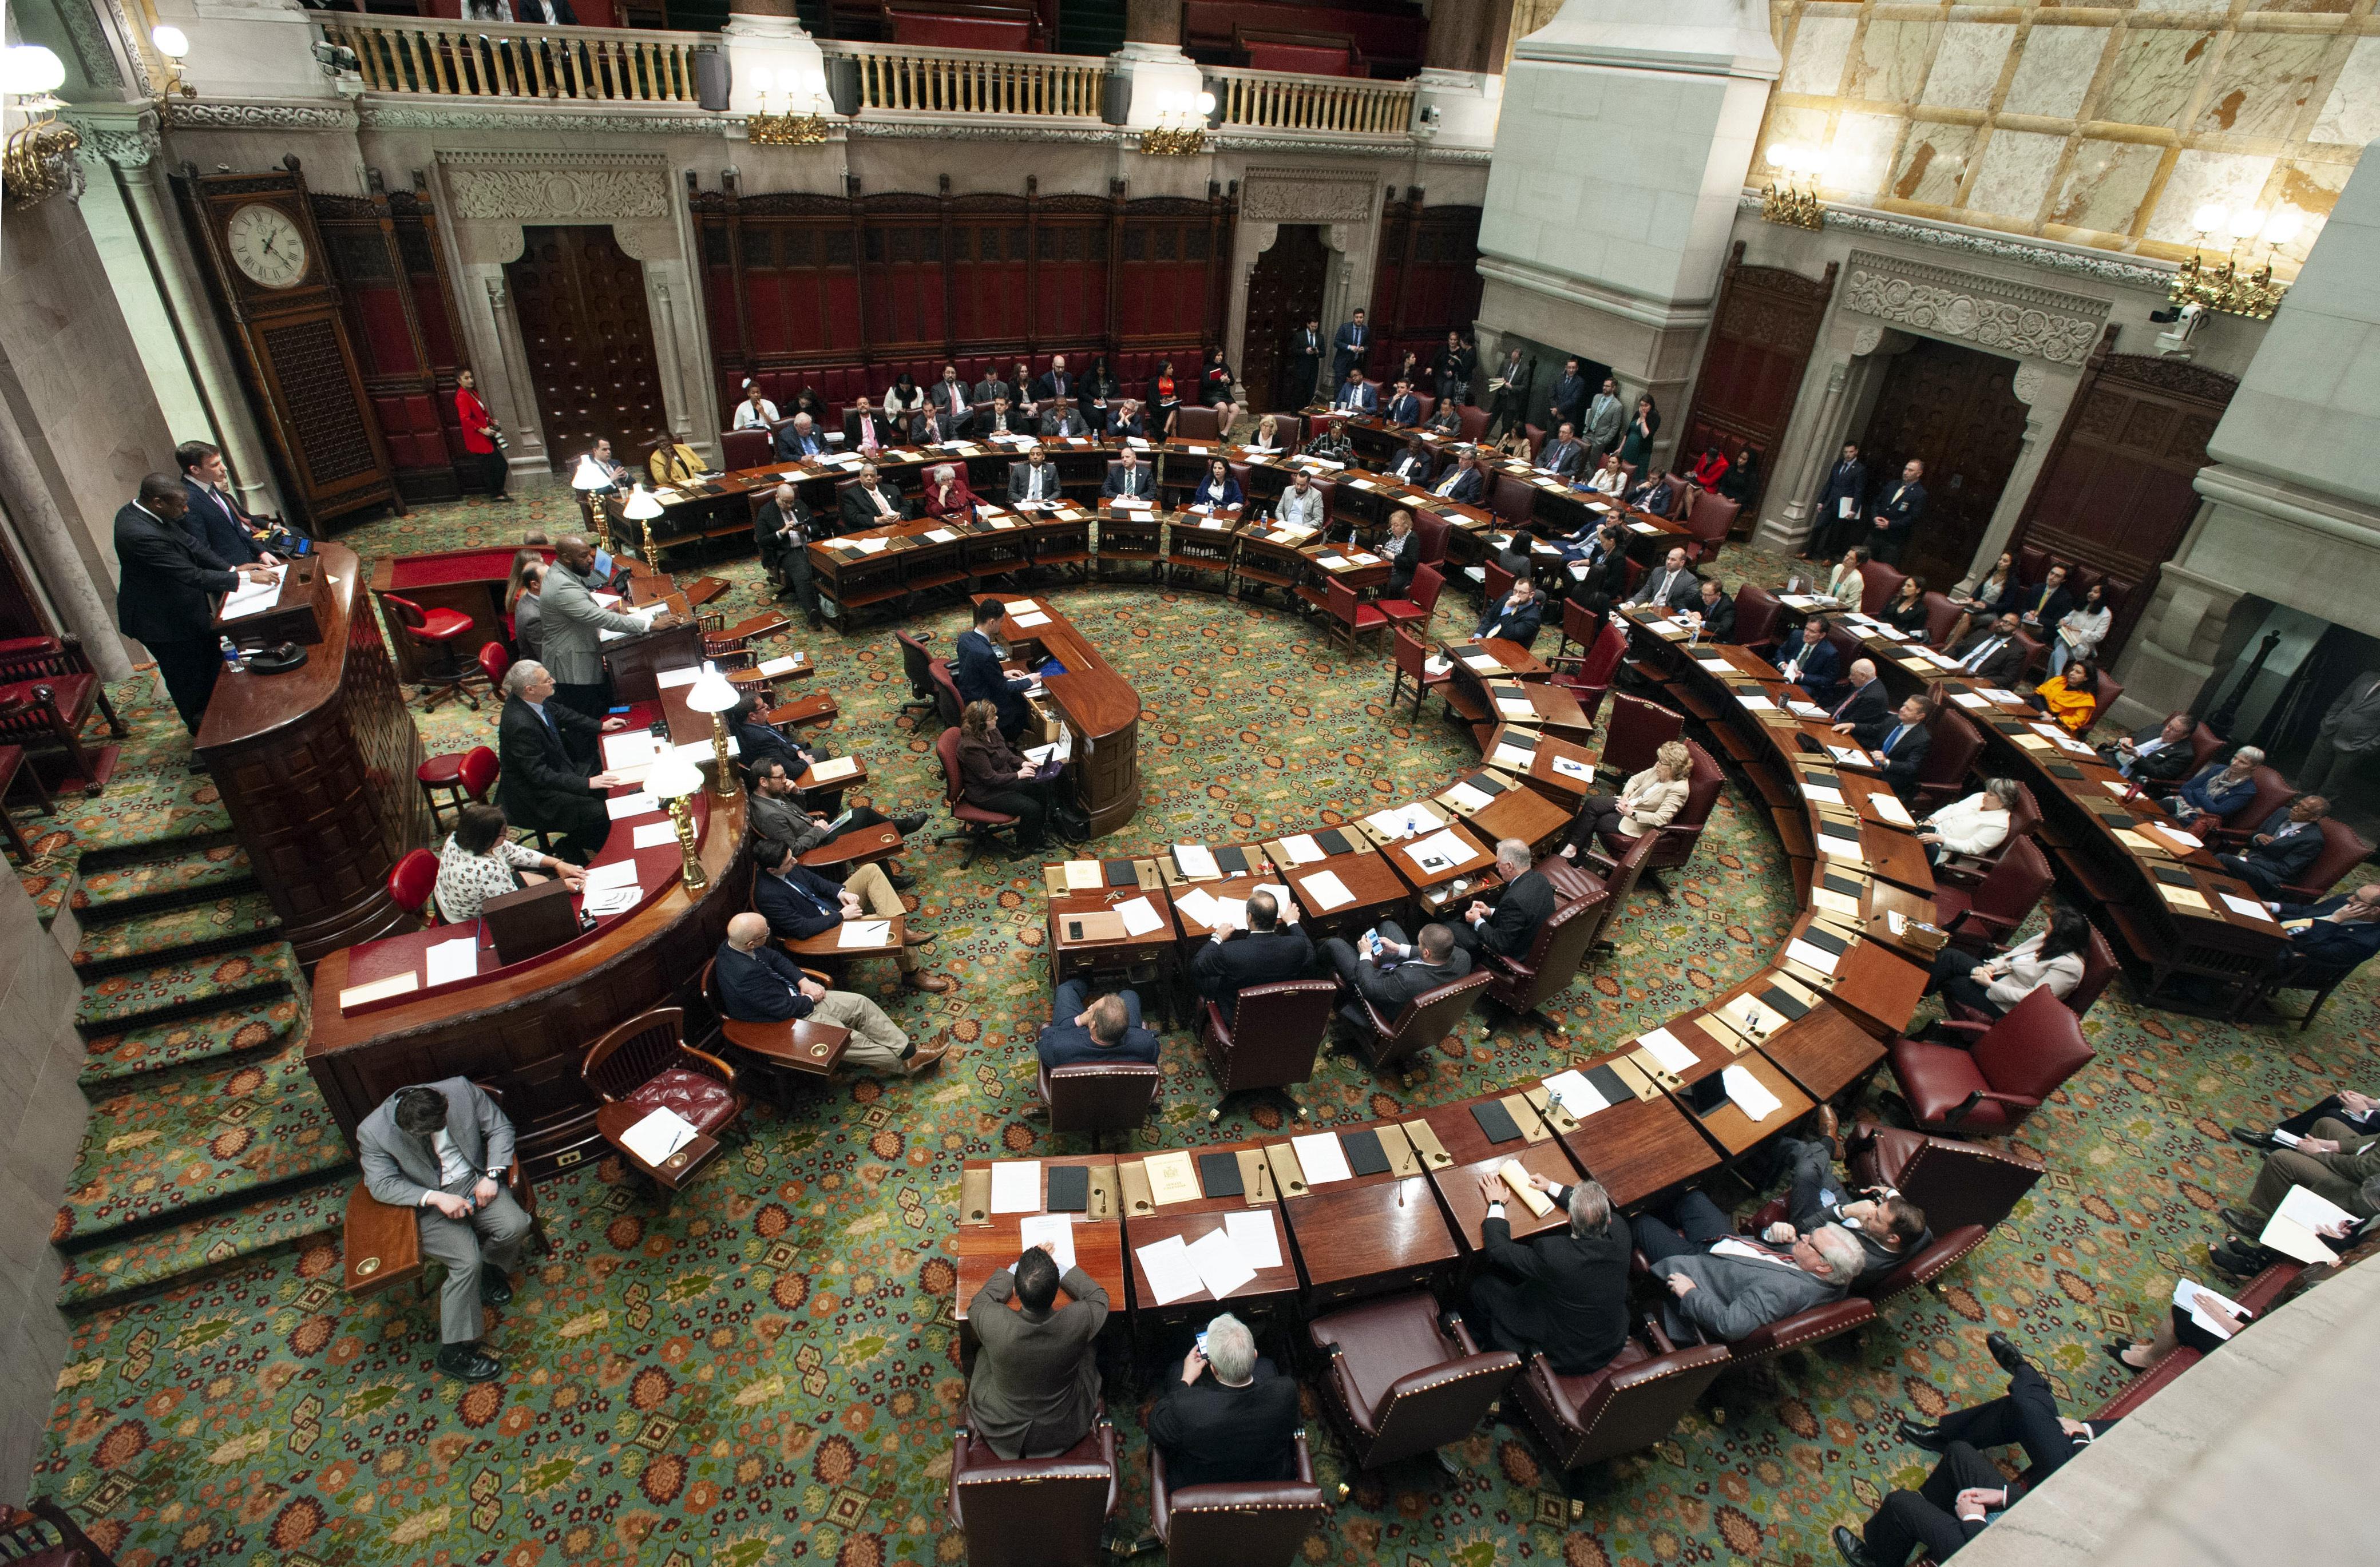 NY Senate OKs bill granting driver's licenses to undocumented immigrants